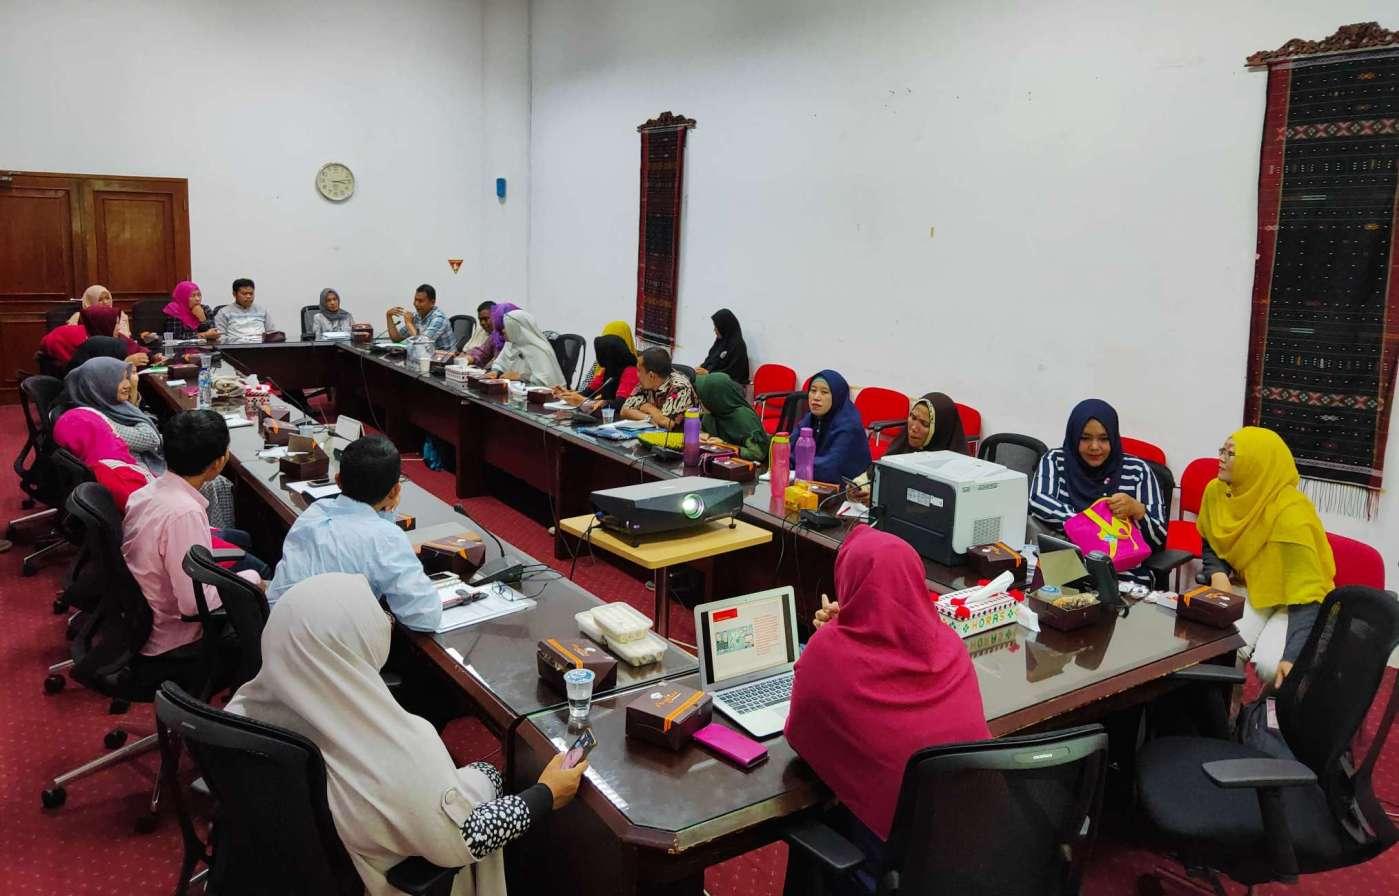 Wirausaha Bank Indonesia